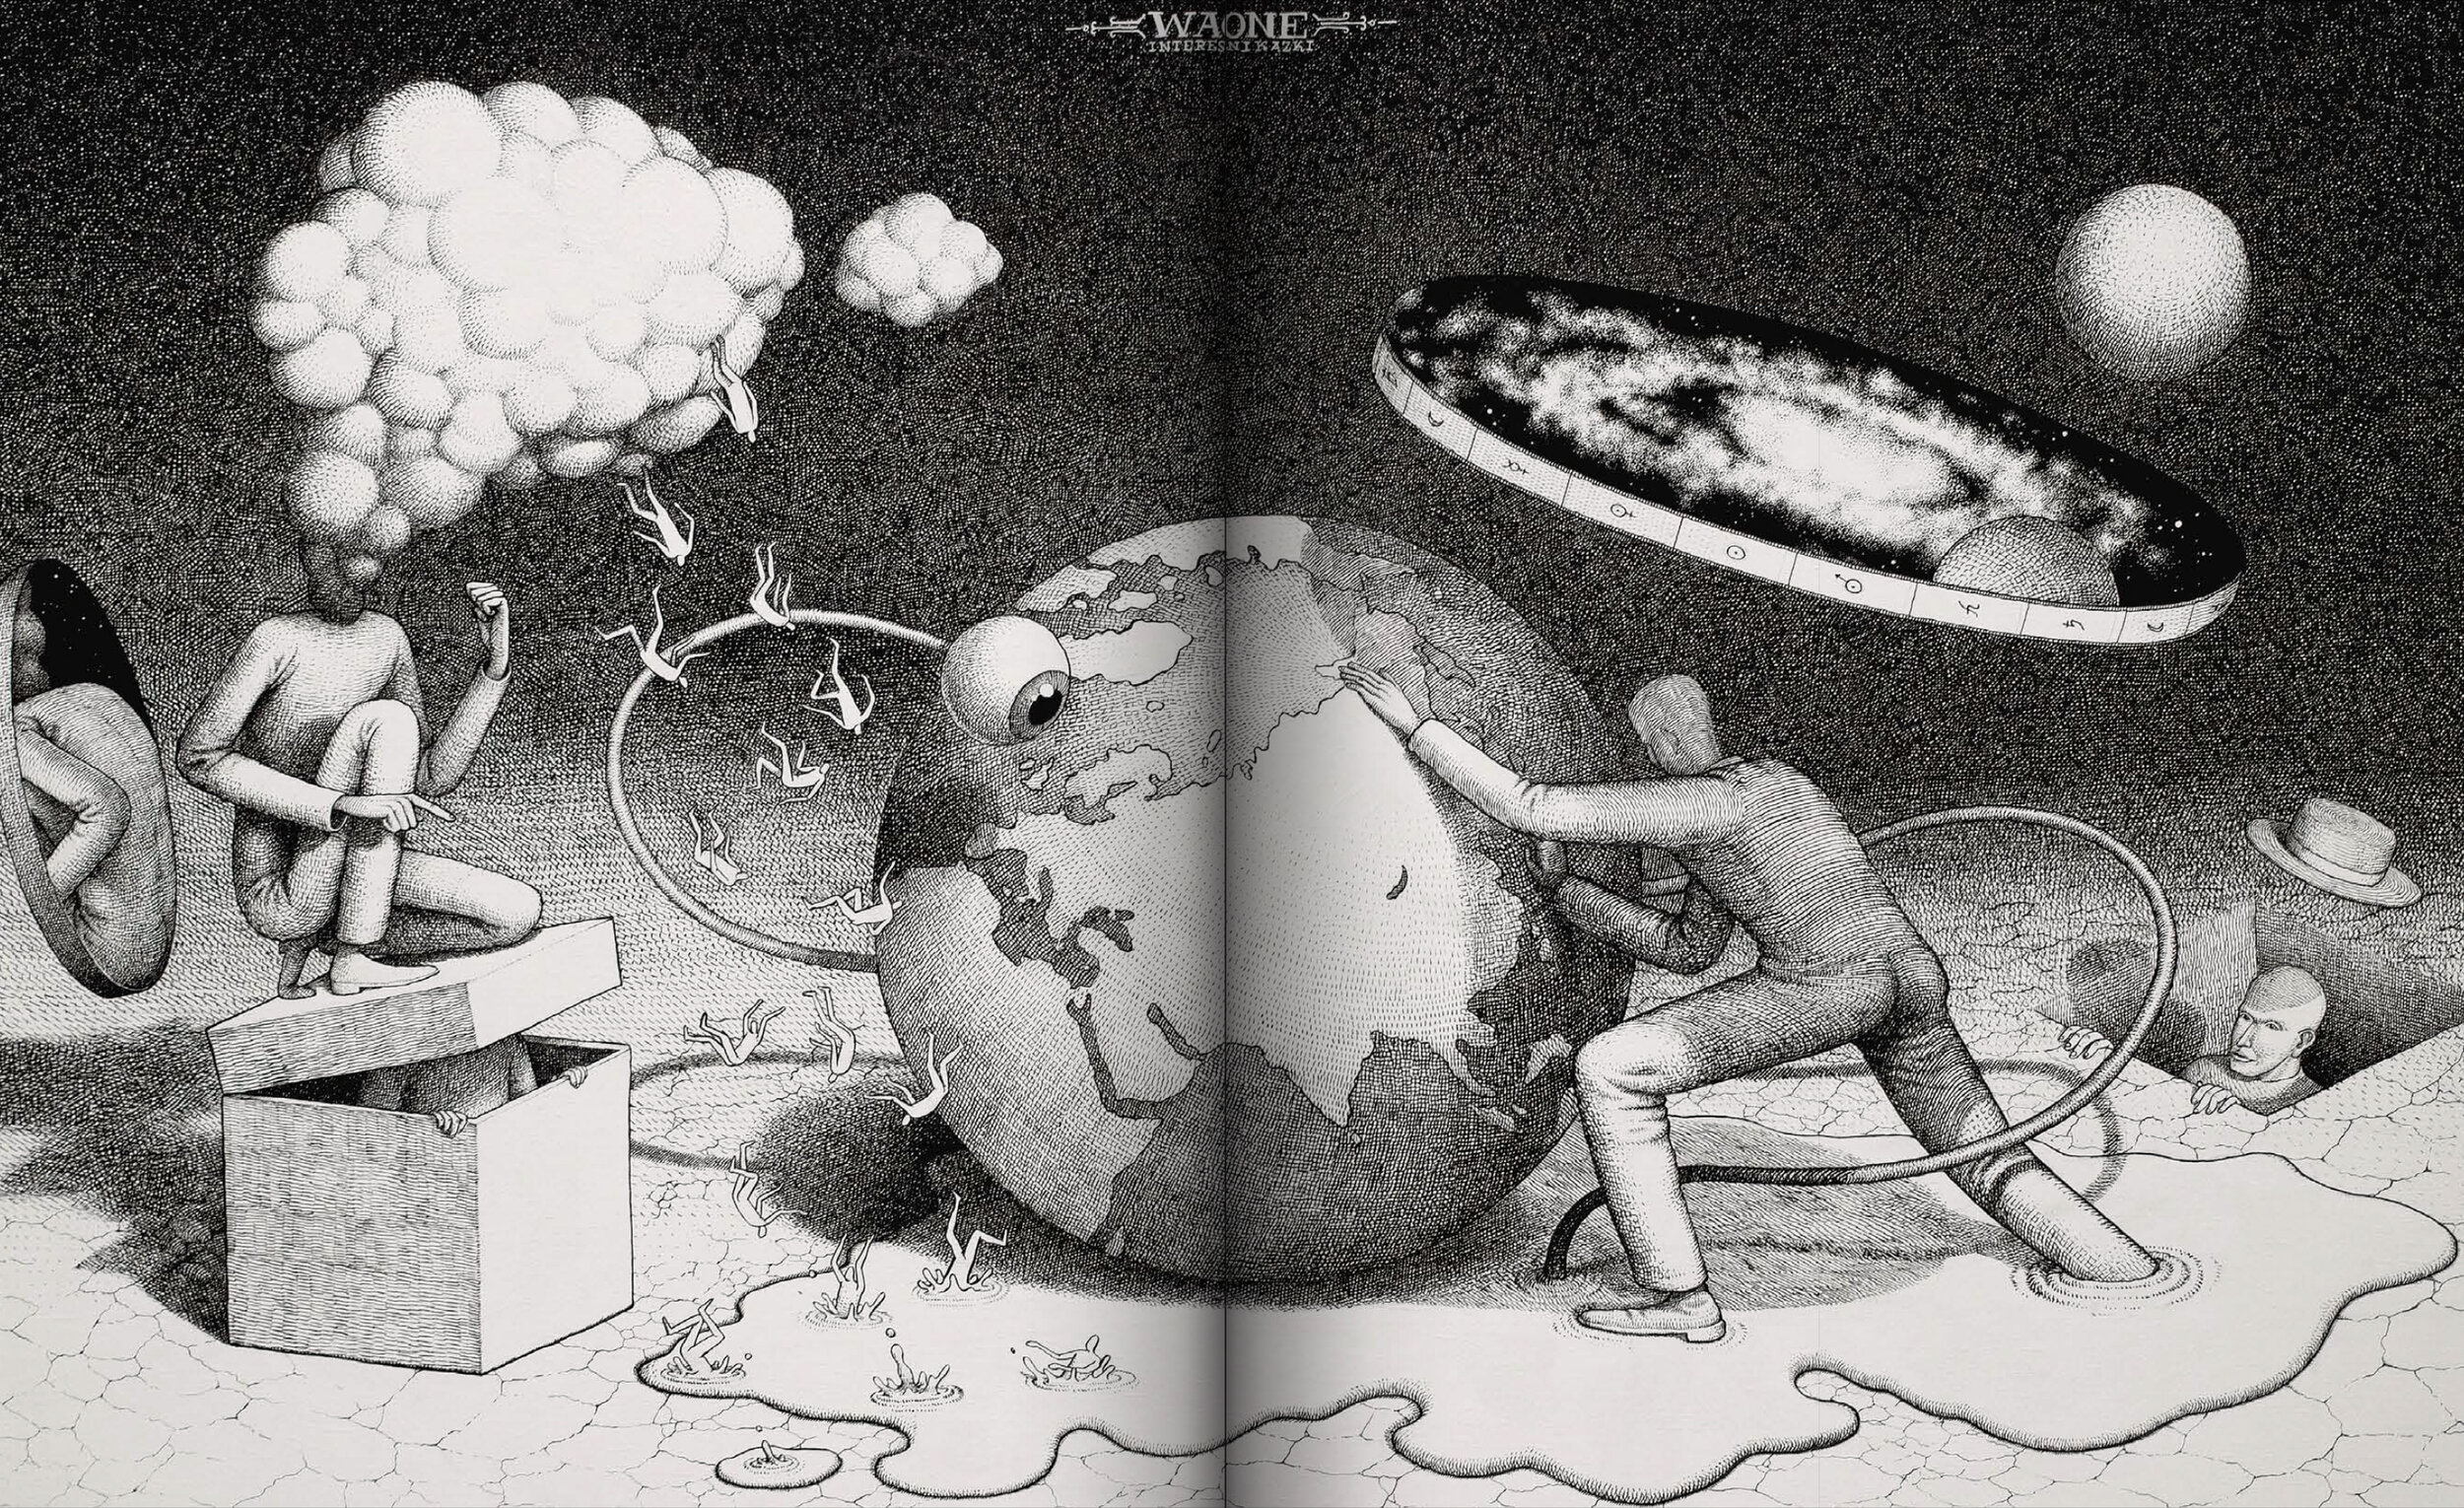 Володимир Waone Манжос випустив артбук Worlds of Phantasmagoria Vol.1